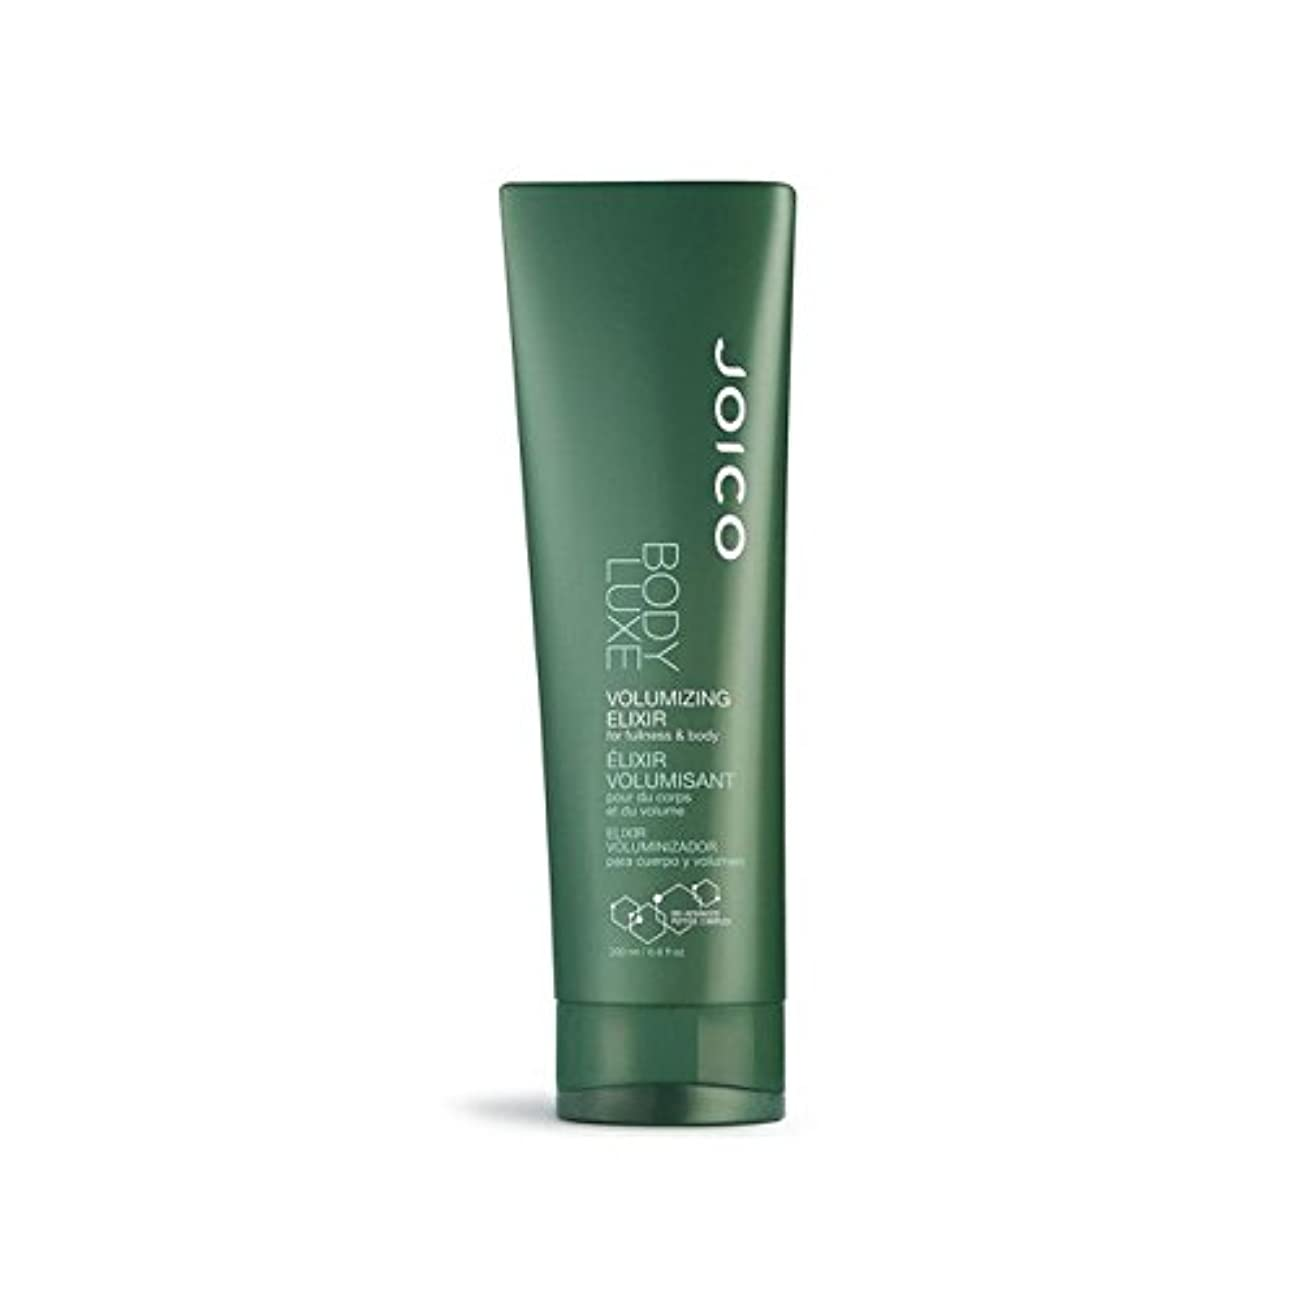 Joico Body Luxe Volumizing Elixir 200ml (Pack of 6) - ジョイコ体ラックスボリューム化のエリクシルの200ミリリットル x6 [並行輸入品]